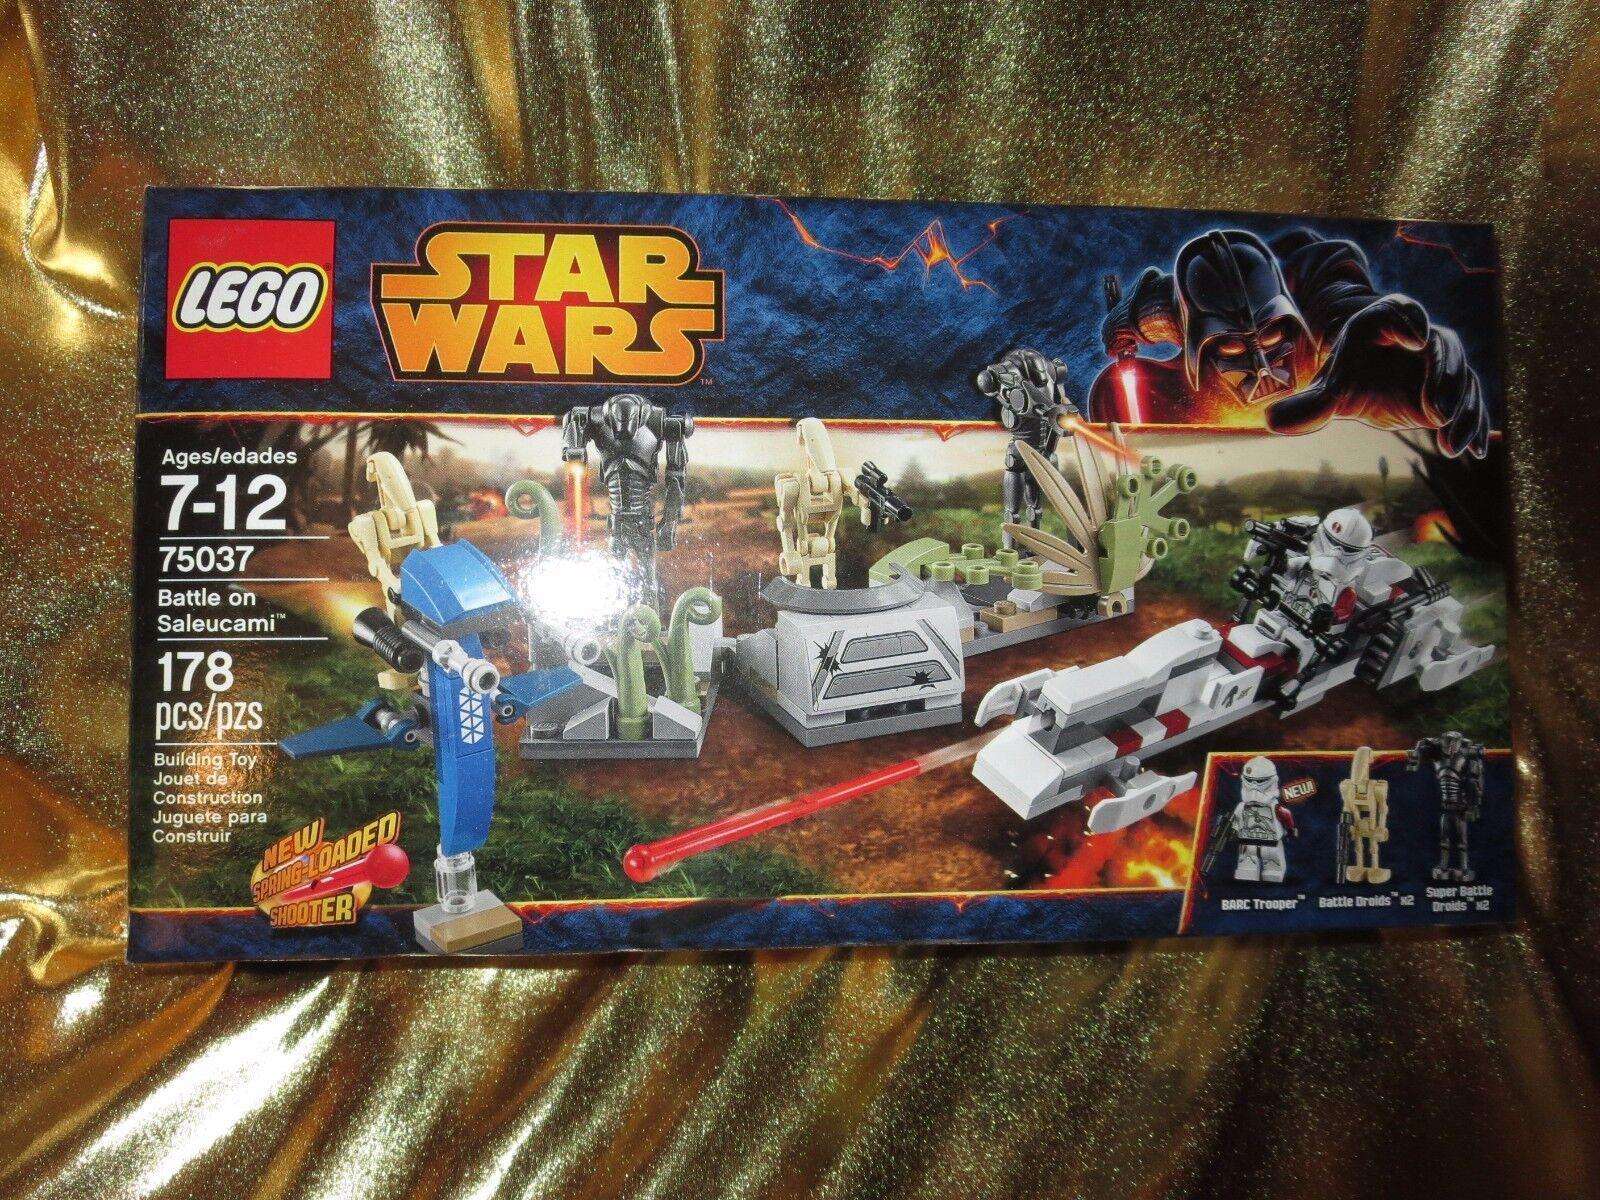 Star Wars Battle On Saleucami Lego Set 178 St.Neu 75037 Im Ruhestand Set